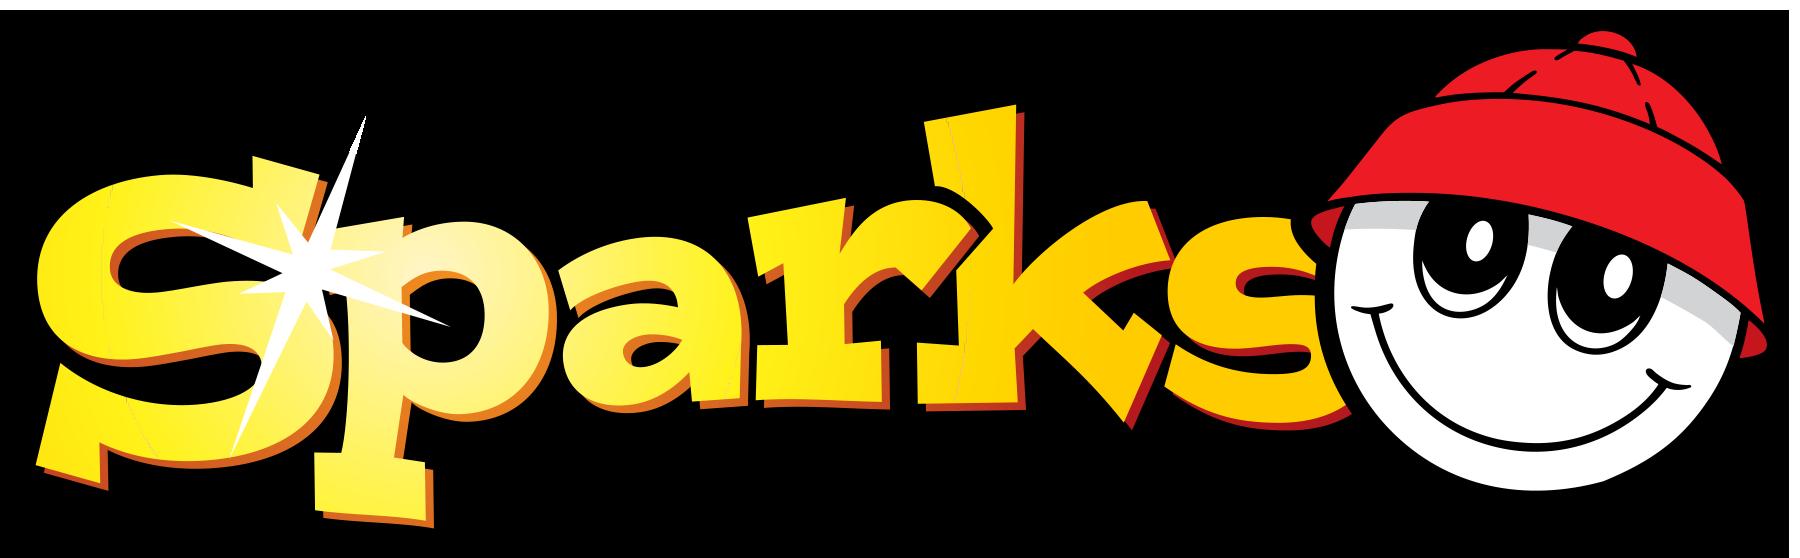 FP - Awana Clubs (Sparks) Logo Full RGB.png